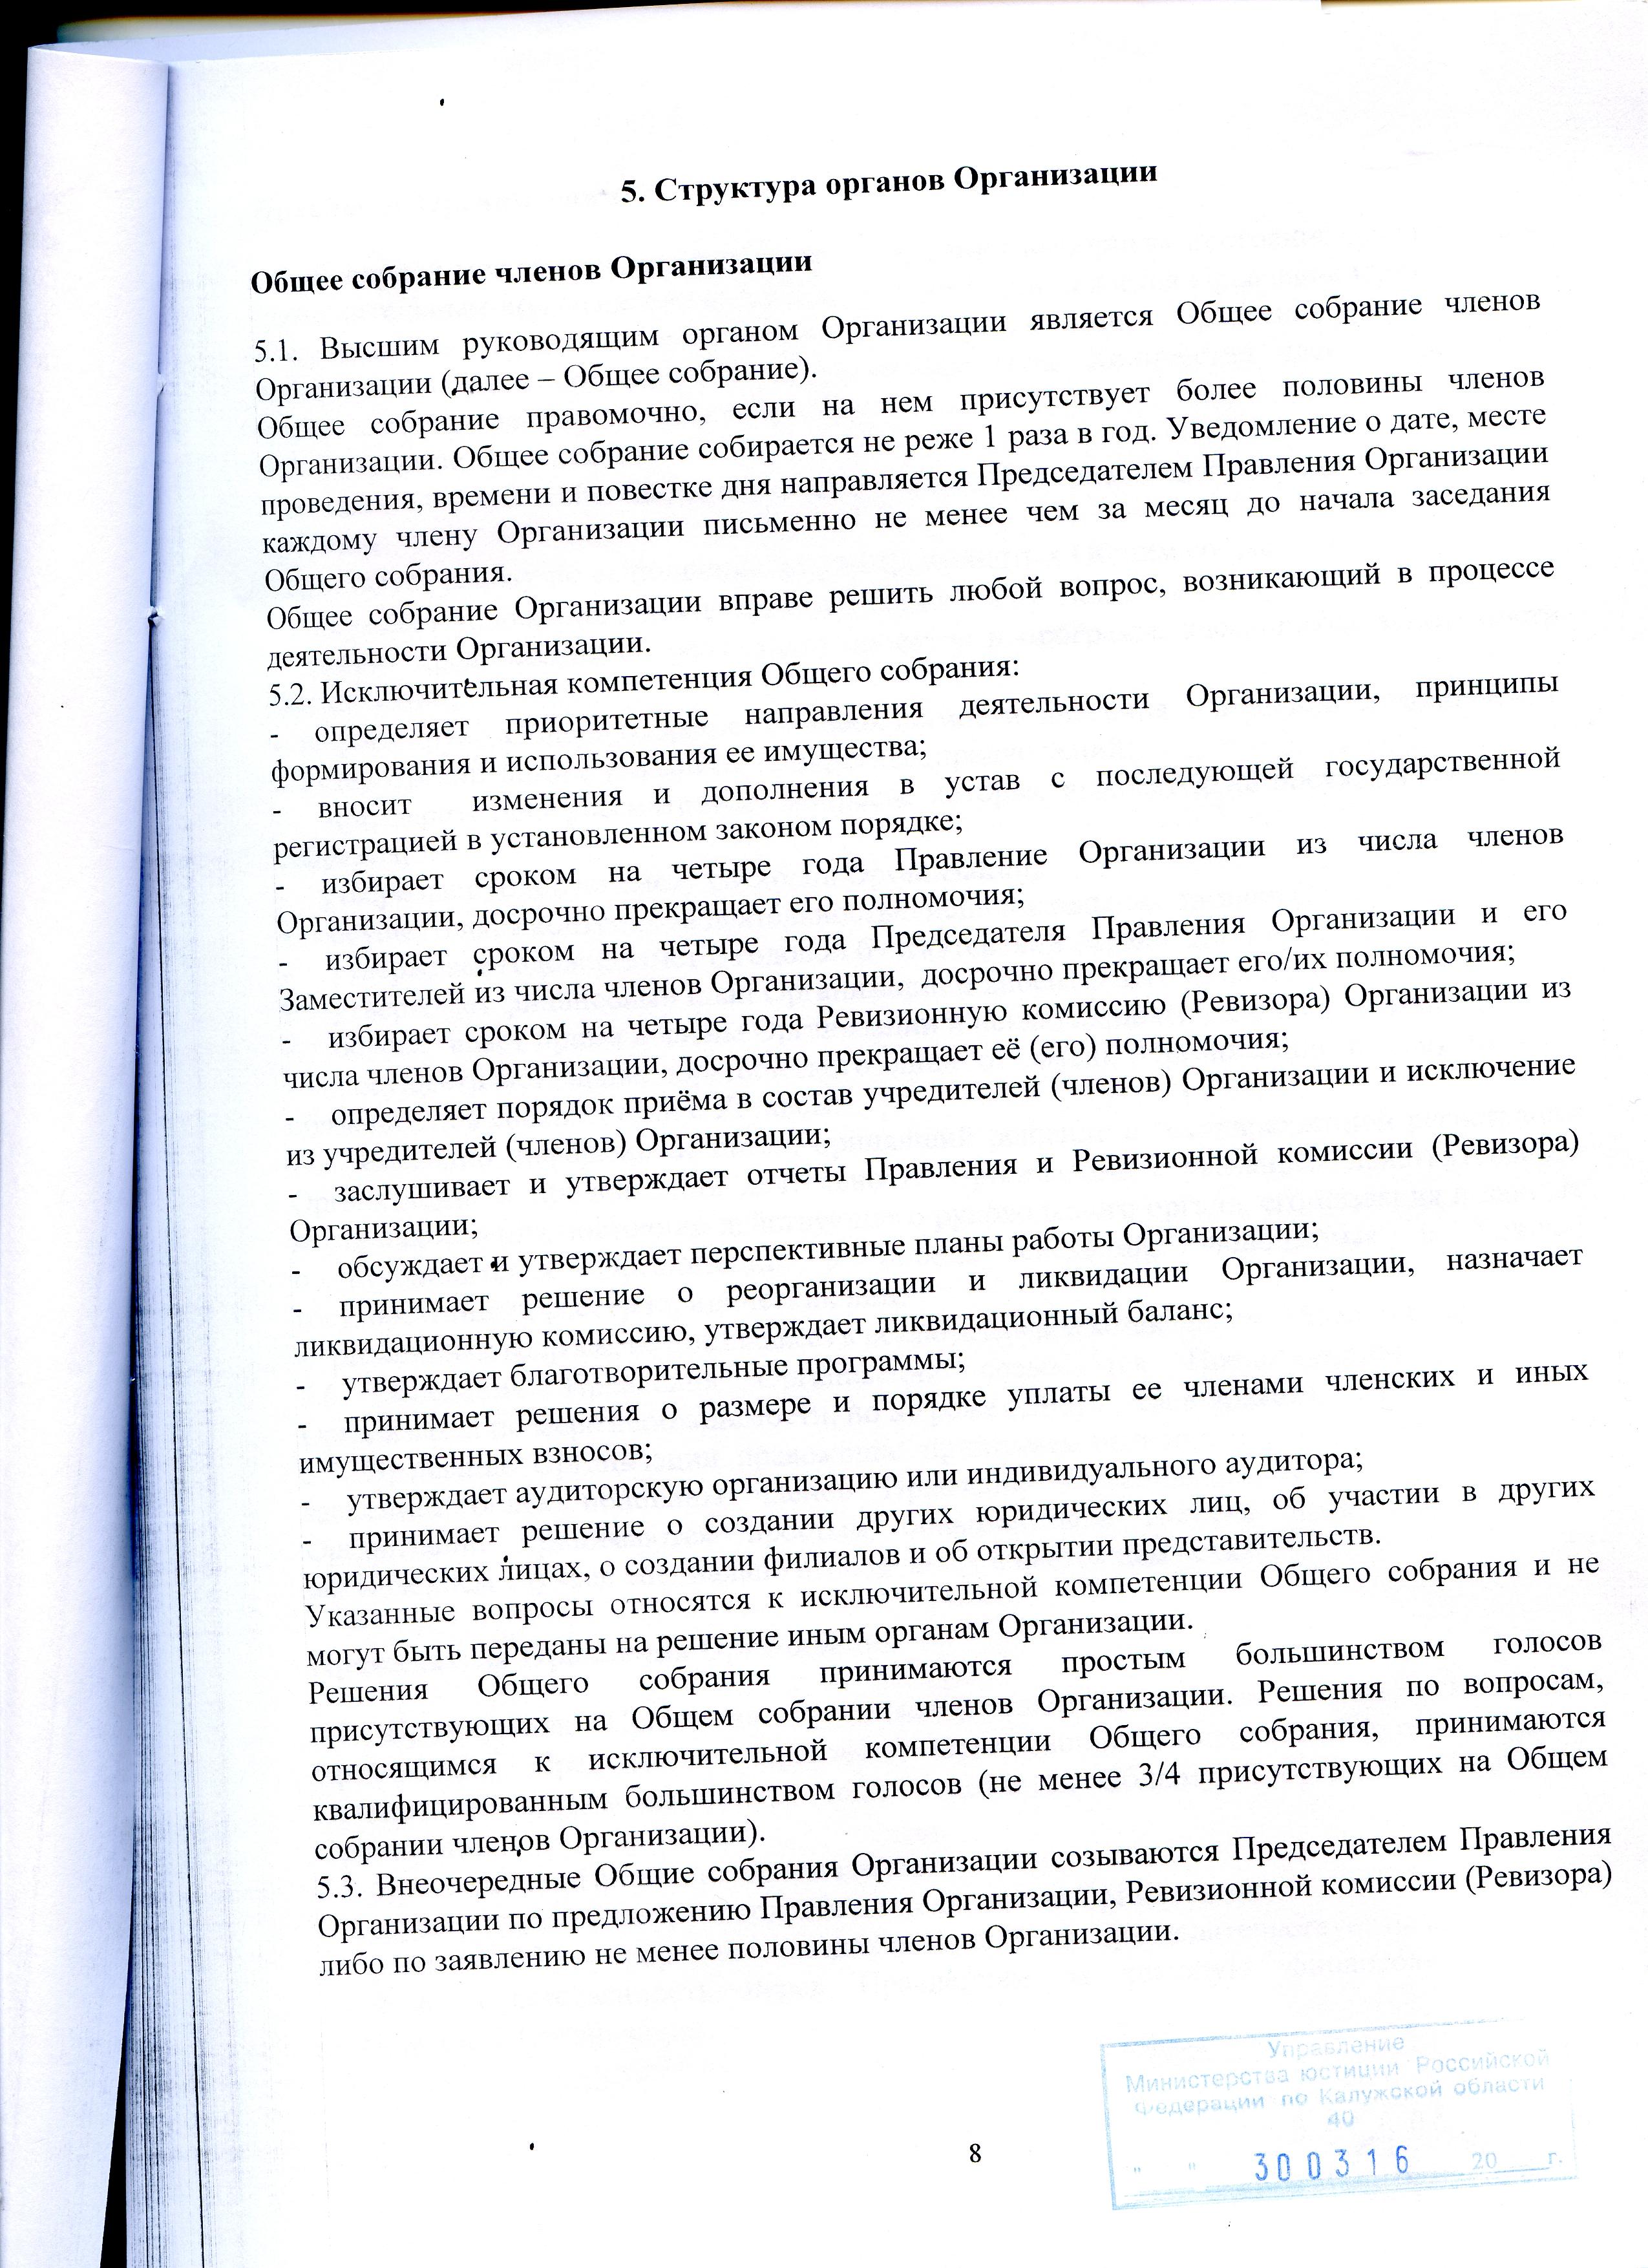 Устав НД 2 редакция069